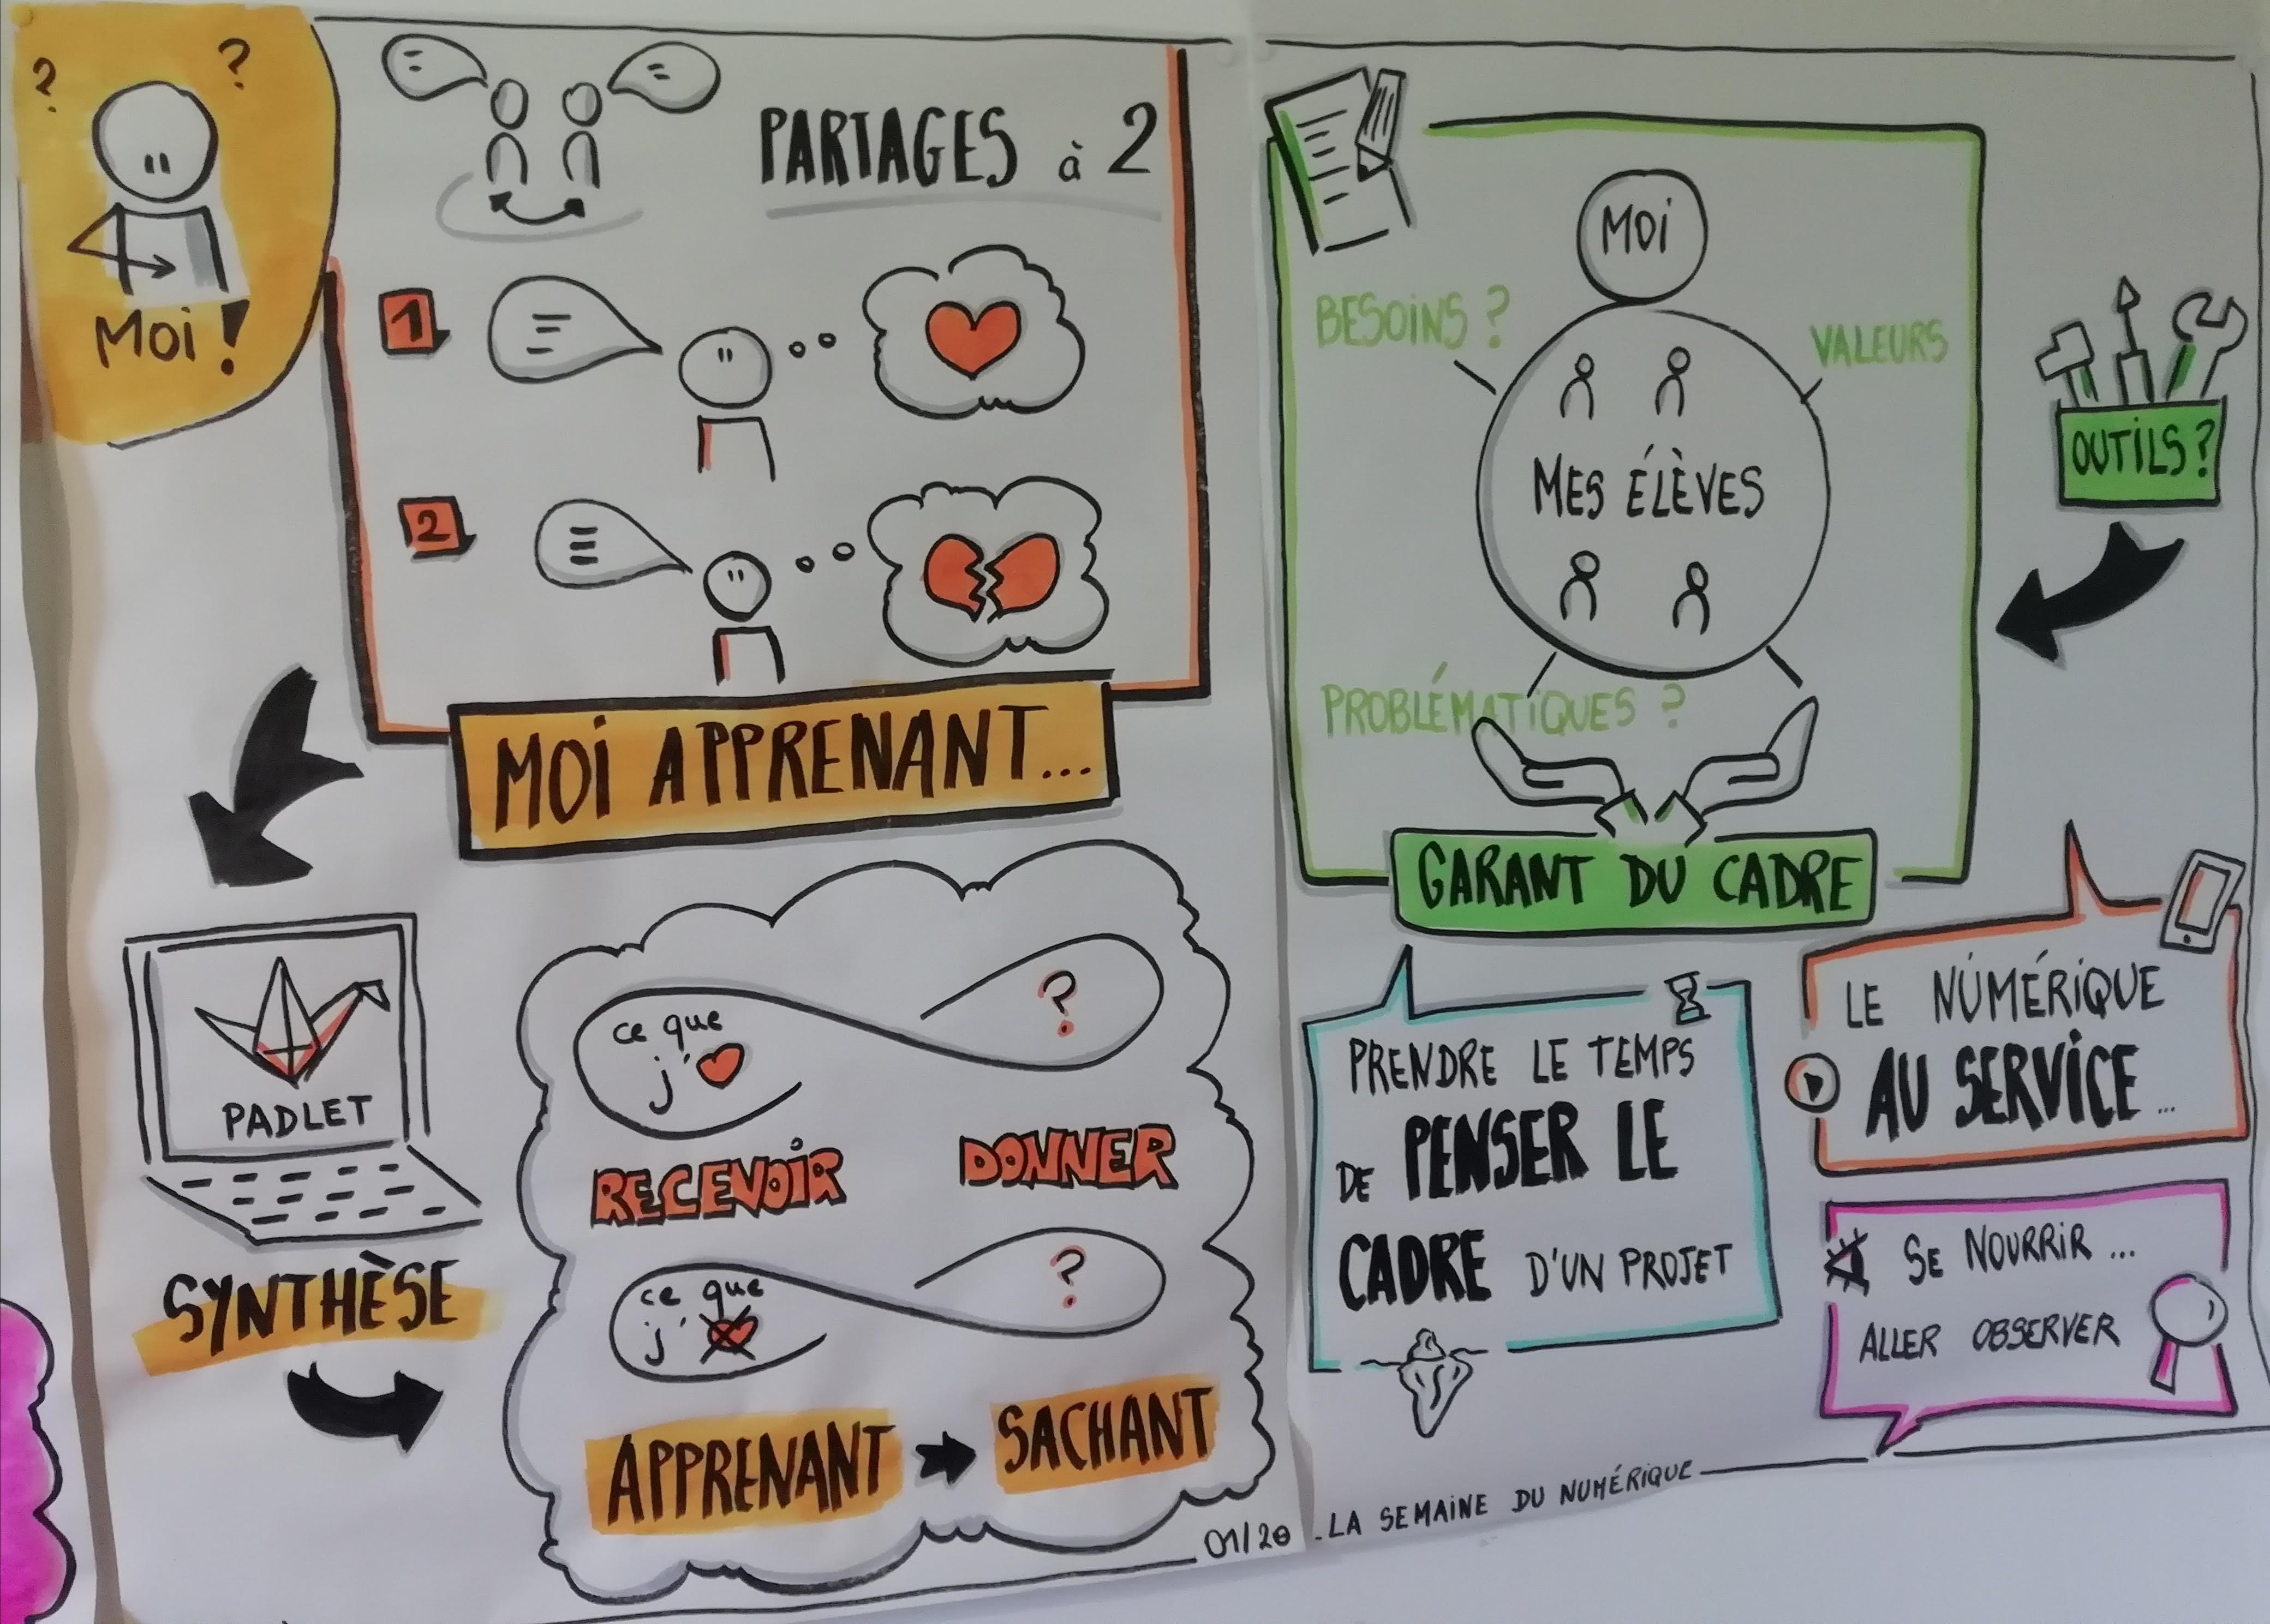 atelier 1 sketchnote 2